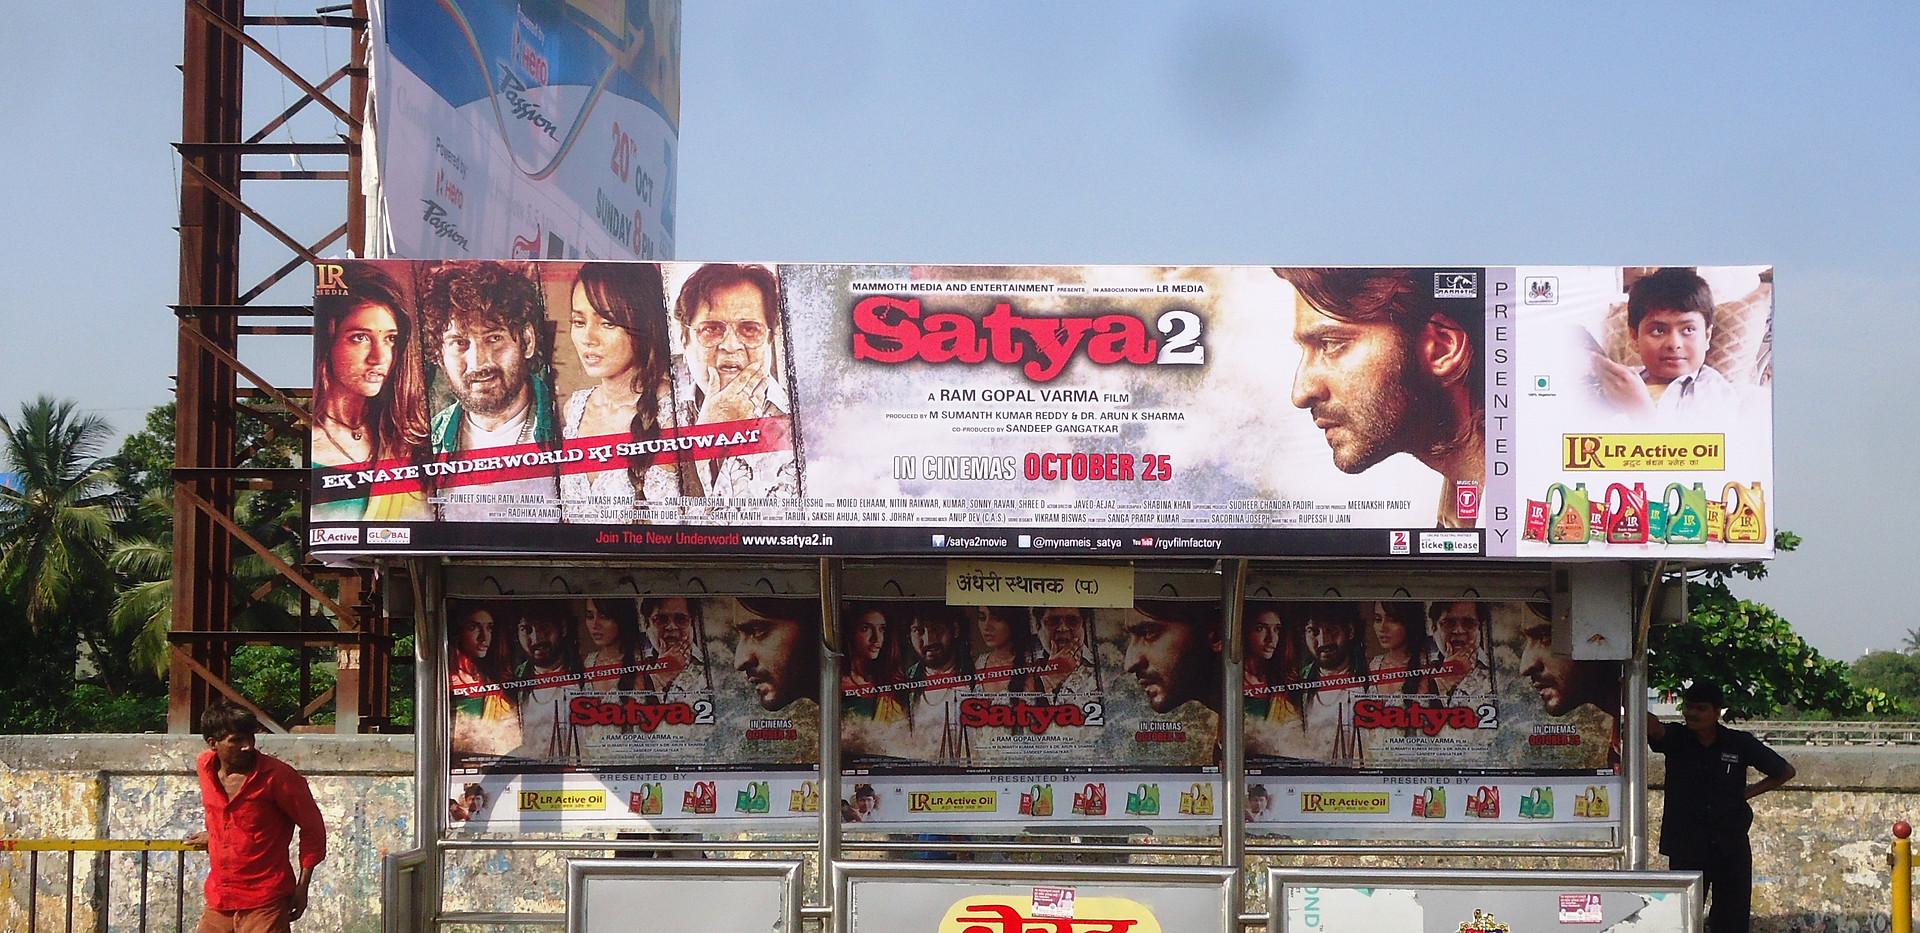 satya-2-movie-bus-shelter-advertising-bu